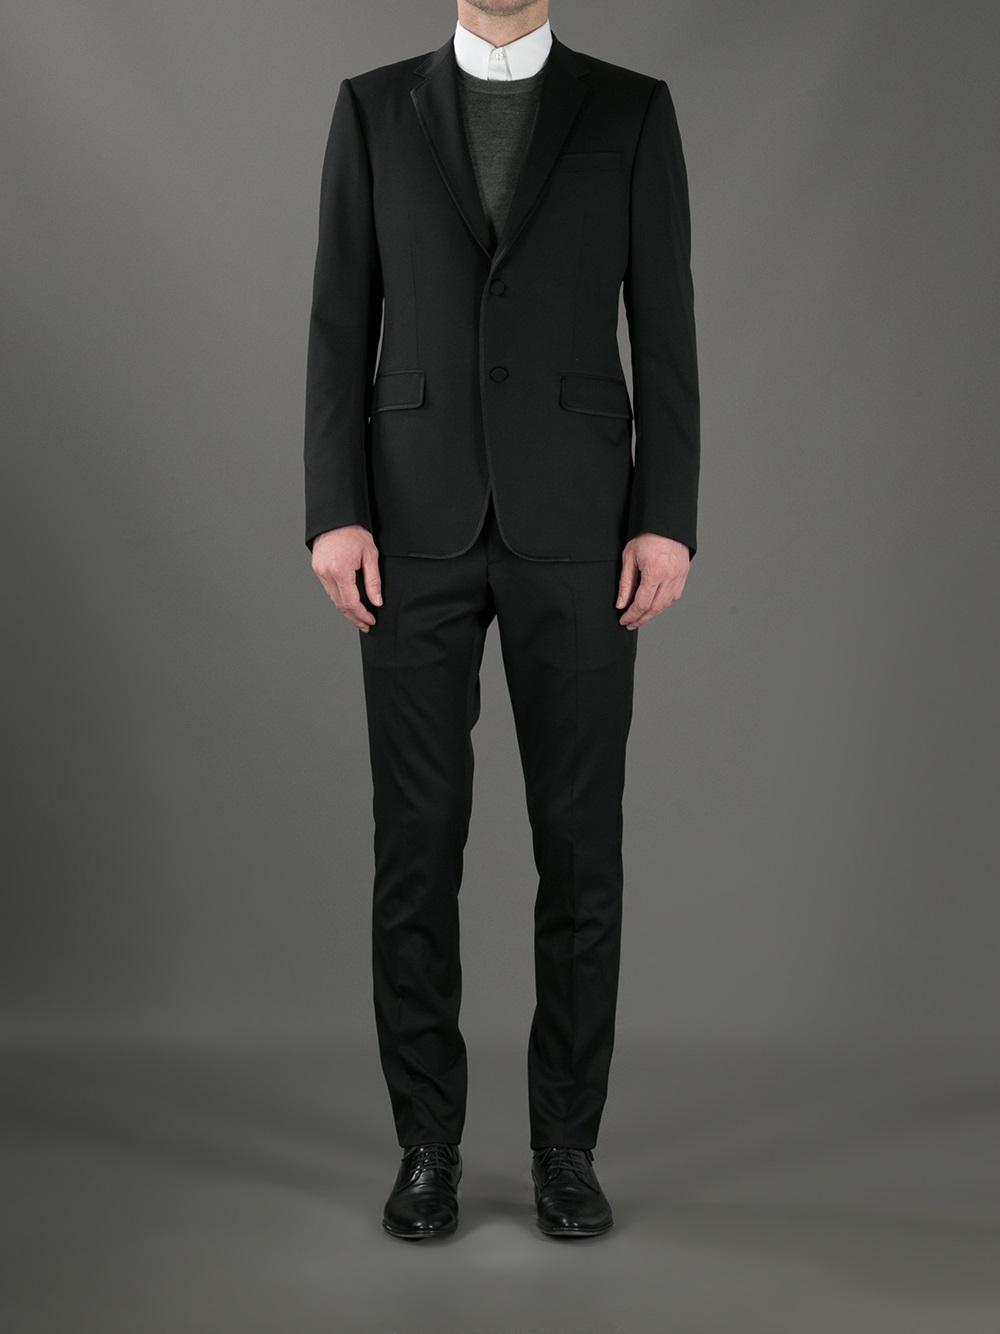 Lyst Gucci Tuxedo Suit In Black For Men